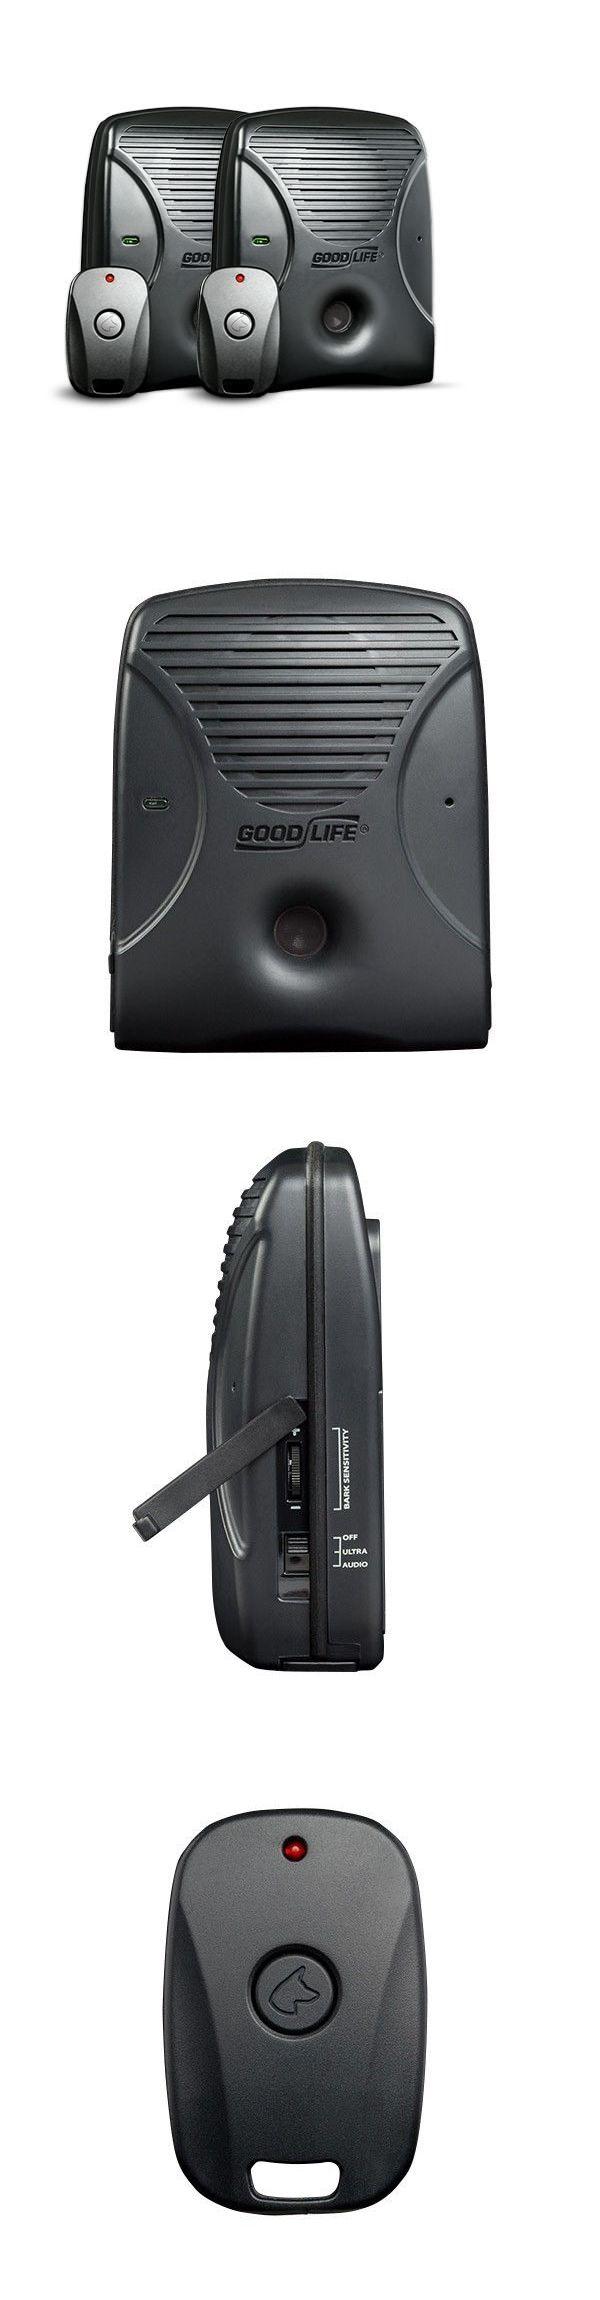 Ultrasonic Bark Control Device Stops Dog Barking Dog Silencer™ MultiPack